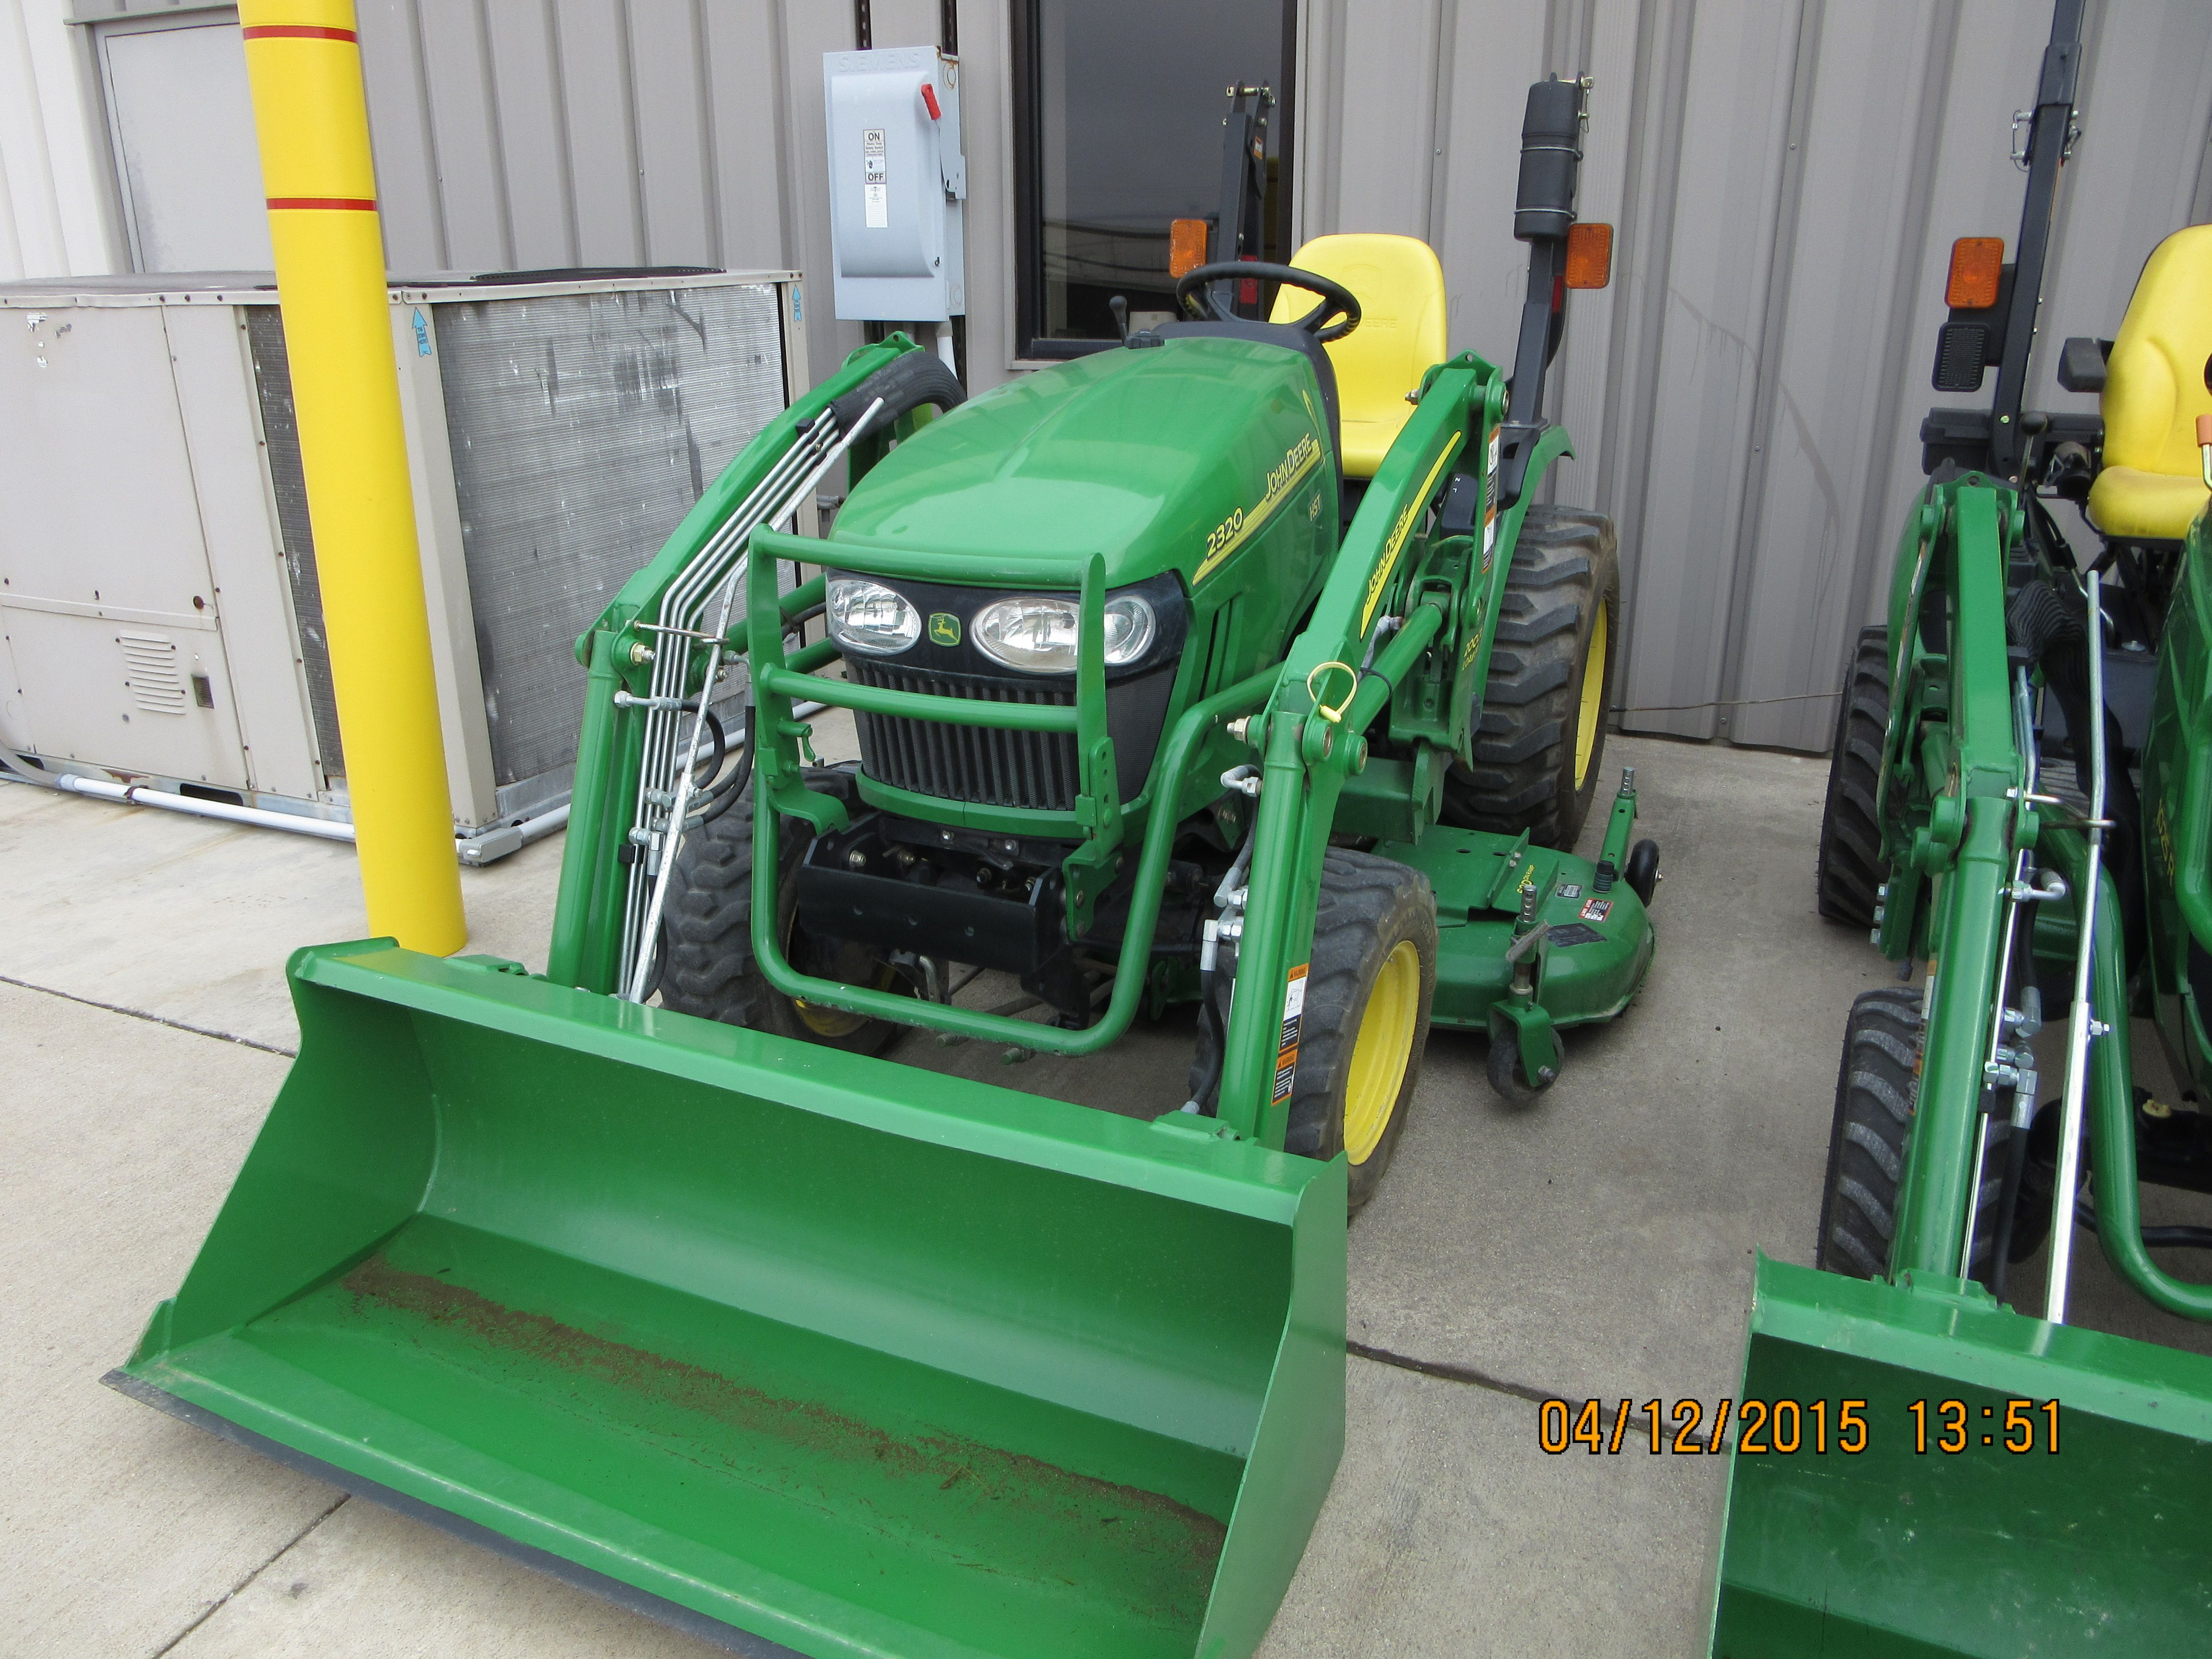 Best 25 John deere 2320 ideas – John Deere Tractor Model 3120 Wiring Diagram 2007